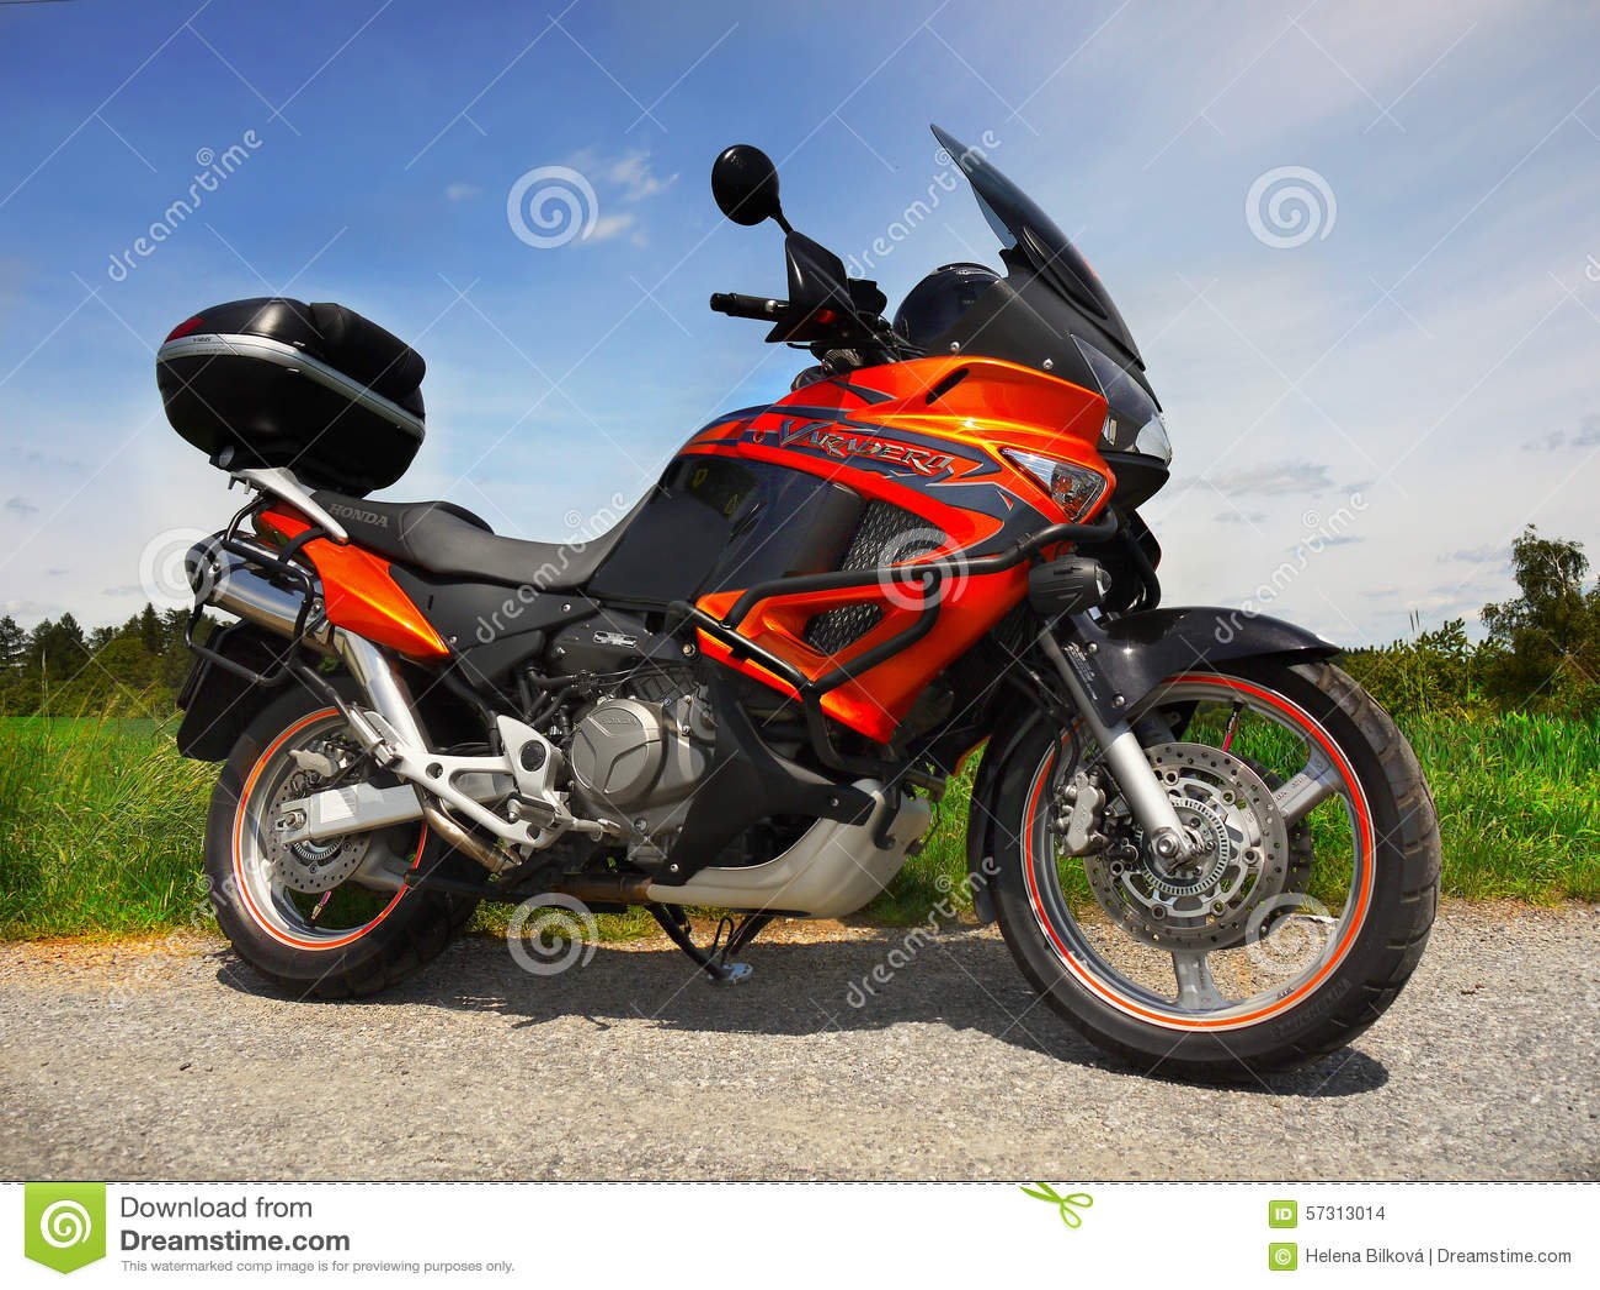 Pin by Rahul Gavale on bikes   Motorcycle, Honda, Honda